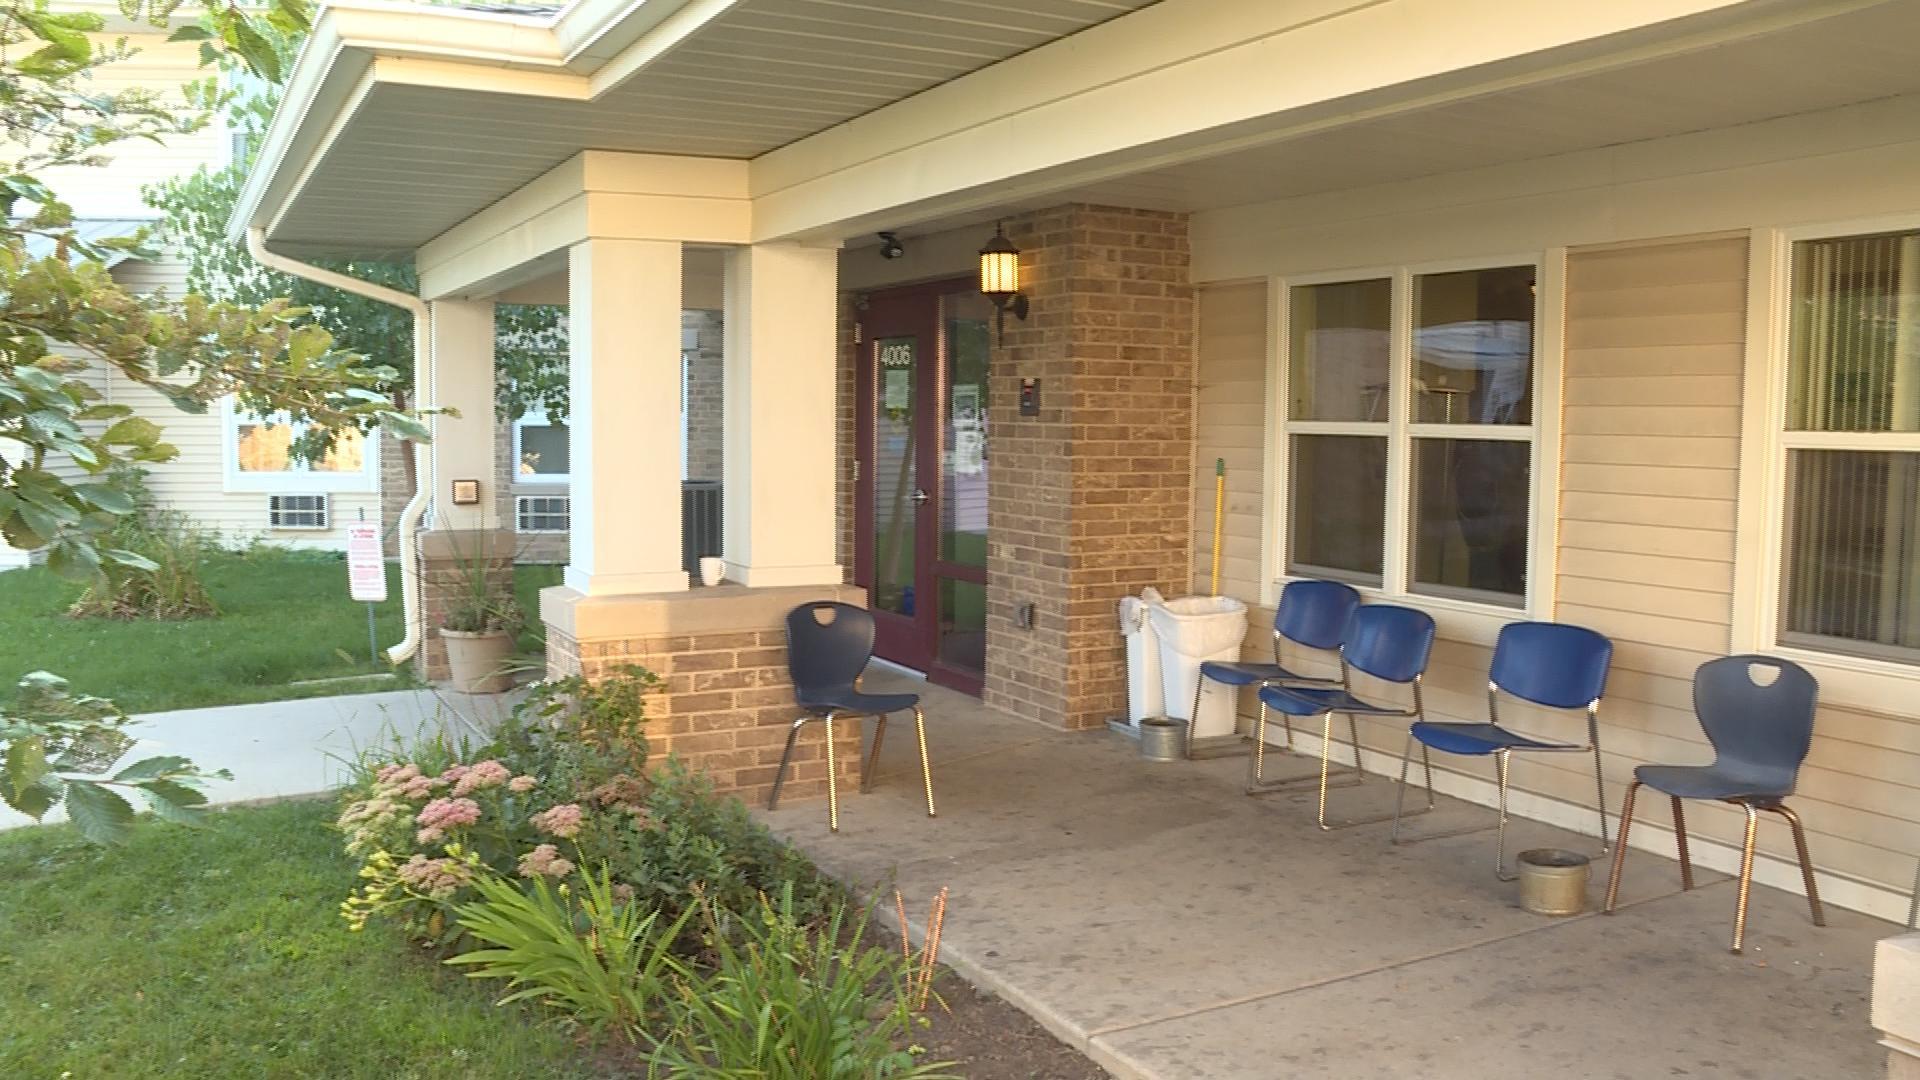 safe haven transitional housing program gets reprieve through cu